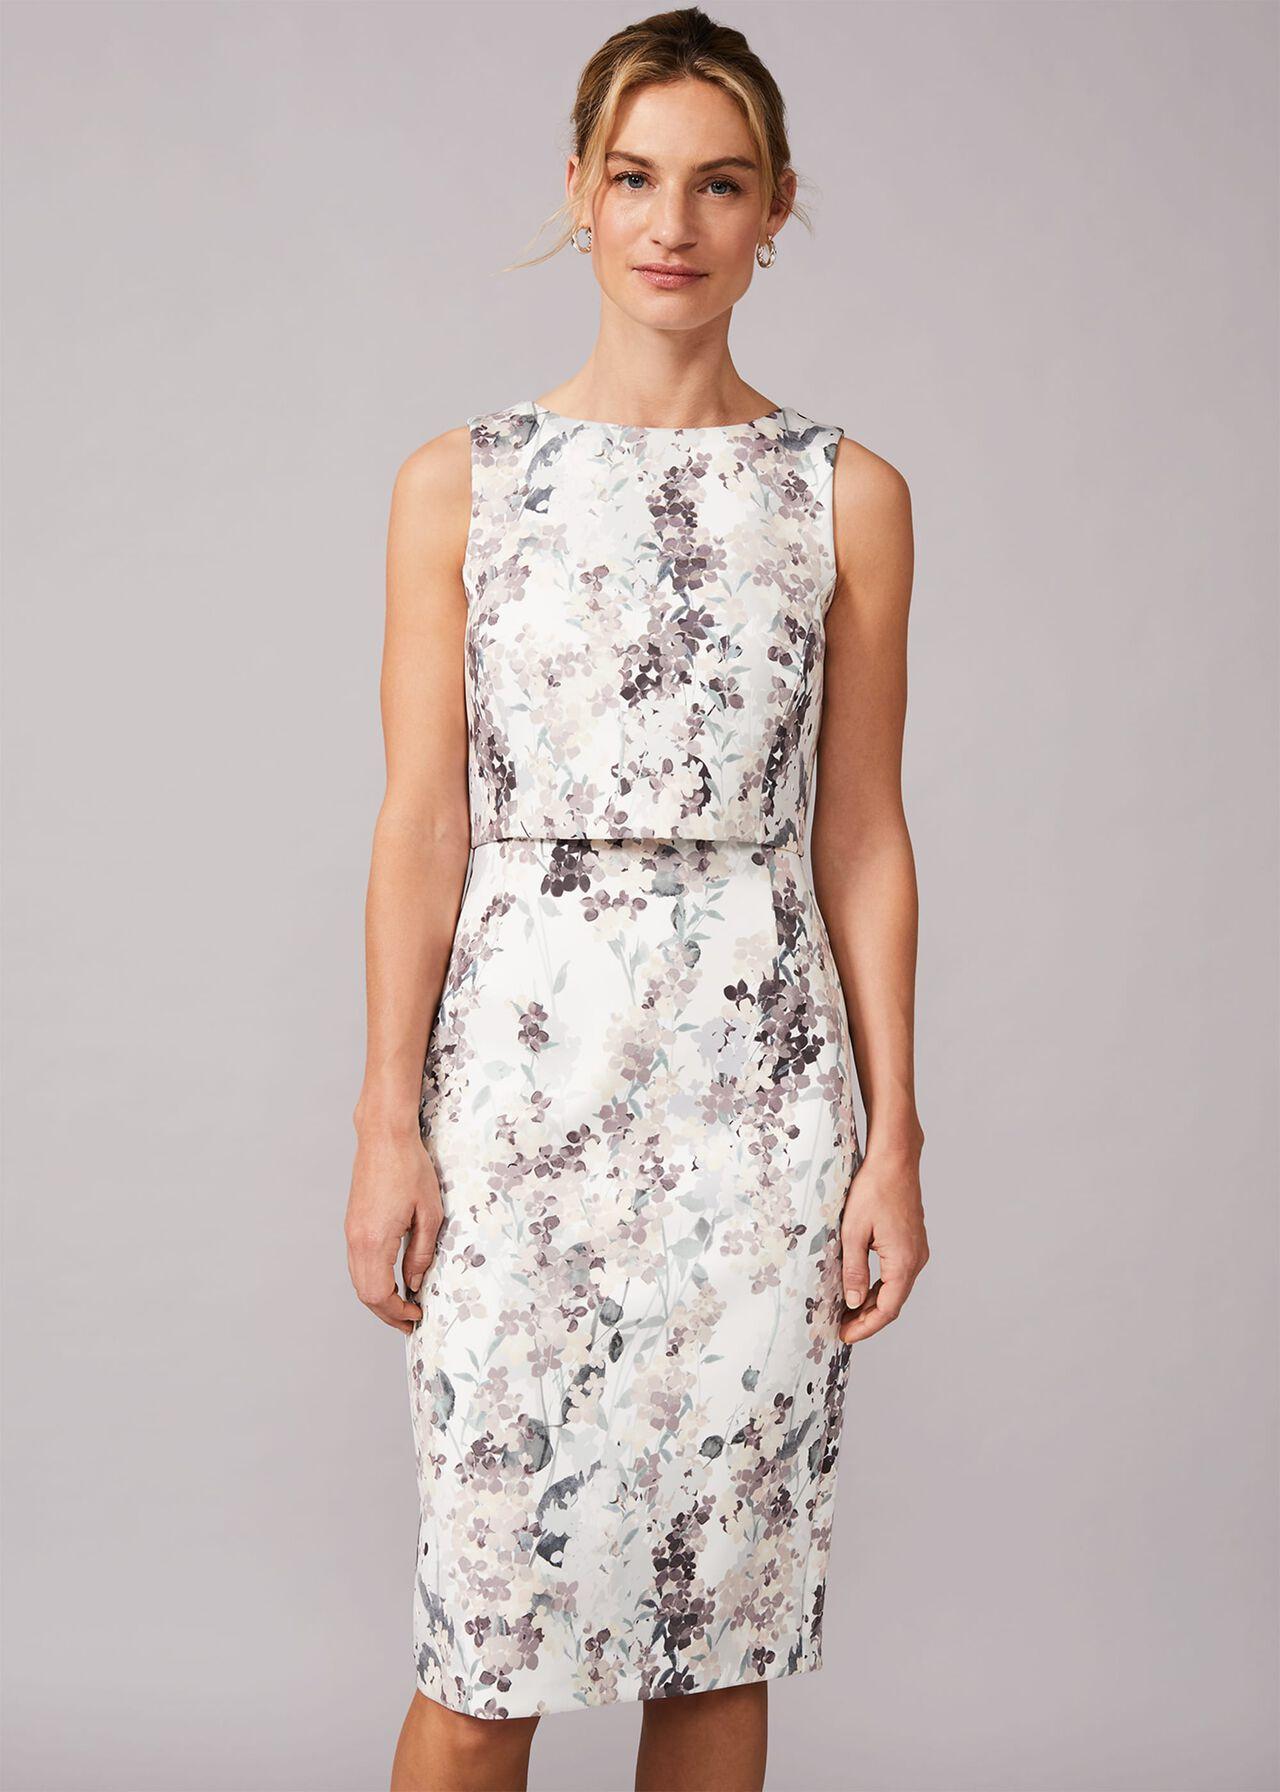 Violetta Double Layered Scuba Dress Phase Eight,Summer Wedding Dresses Guest 2020